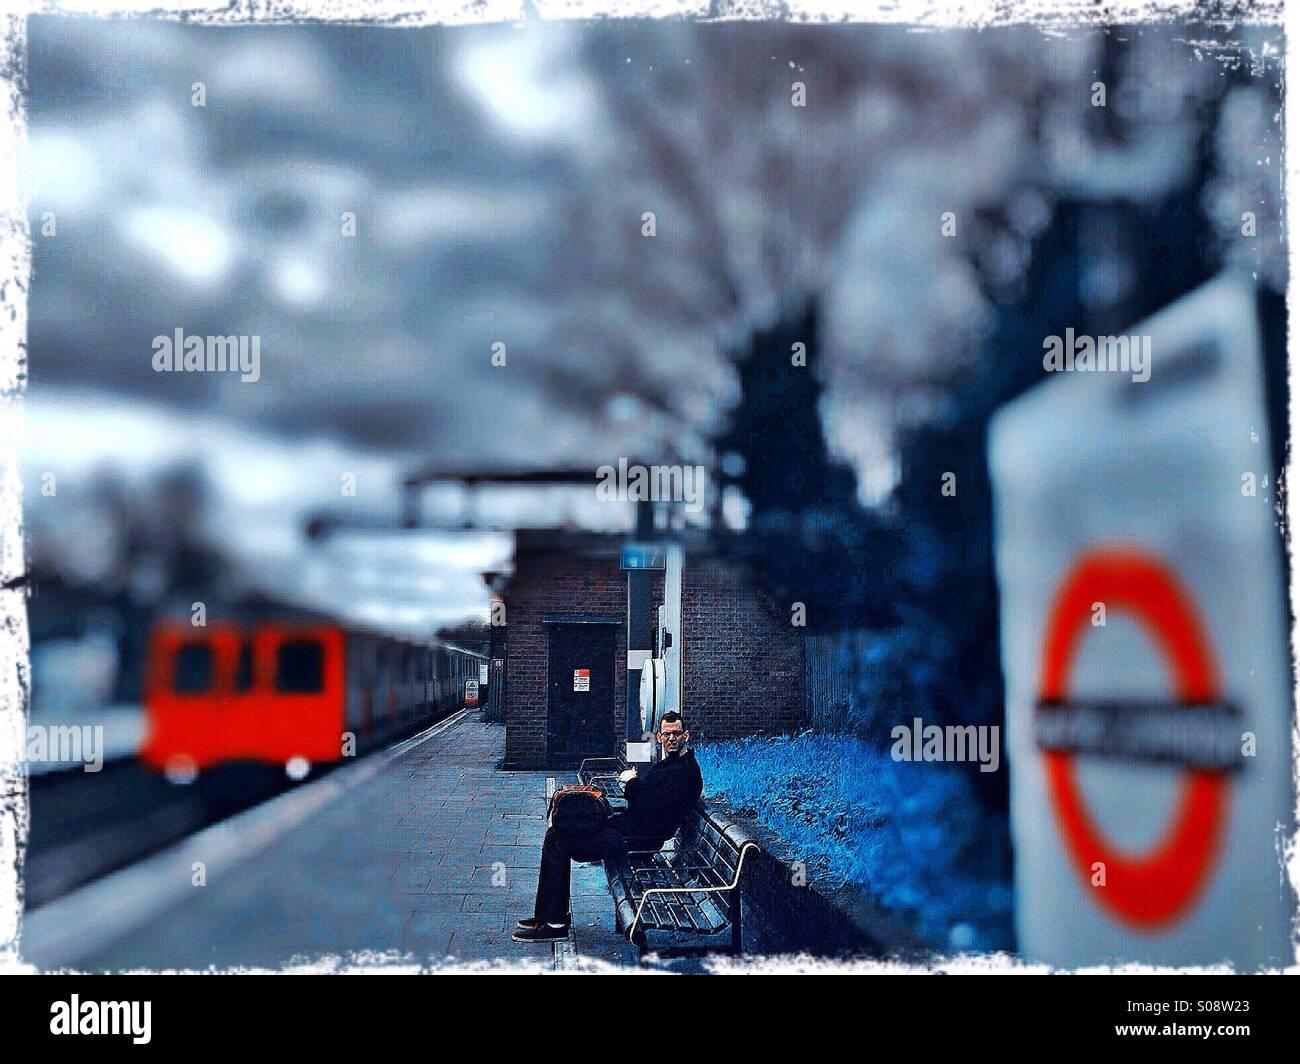 Man waiting for train at Ealing Common tube station, West London, UK Stock Photo